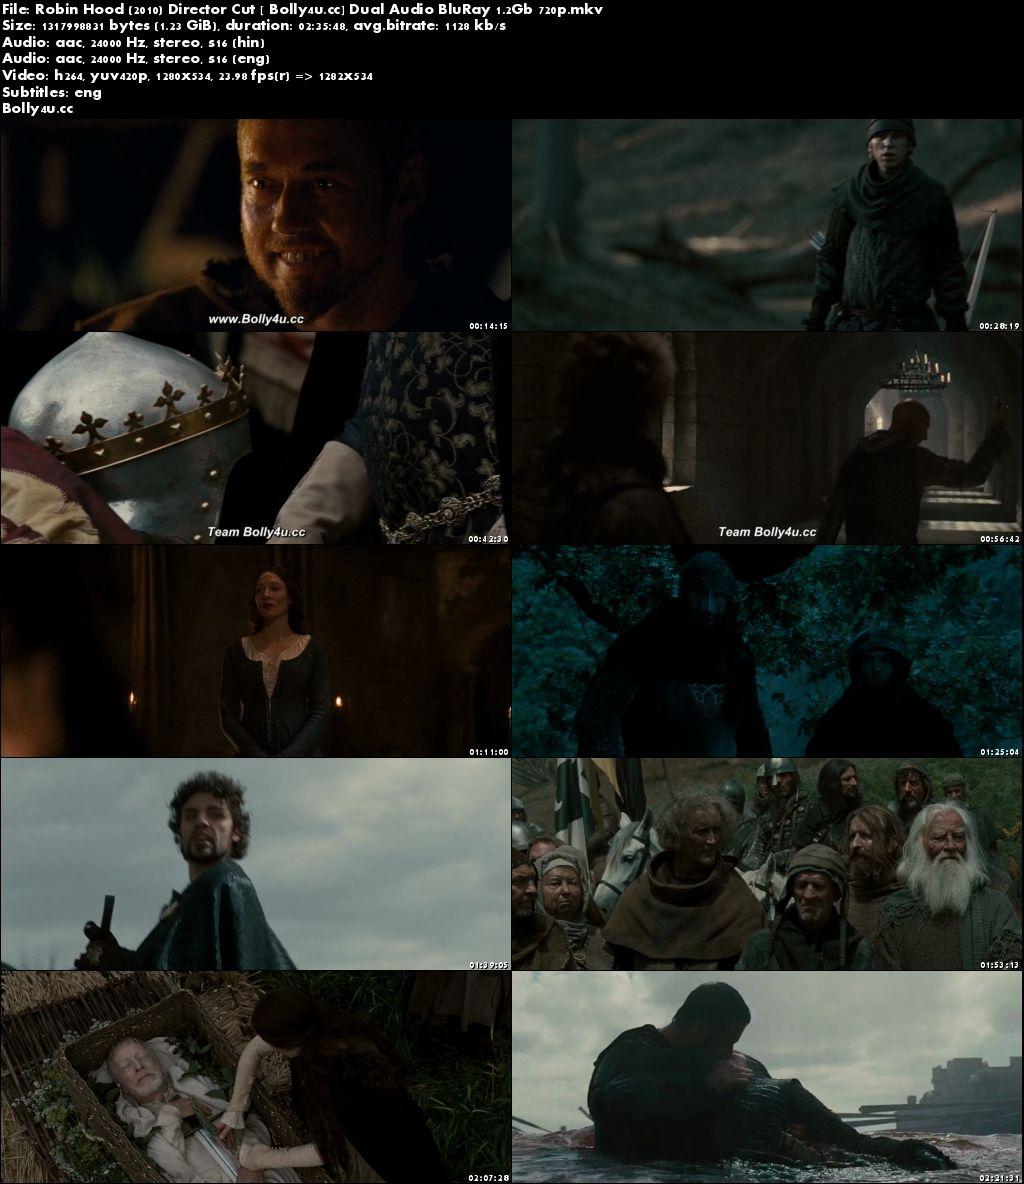 Robin Hood 2010 BluRay Director Cut Hindi Dual Audio 720p Download